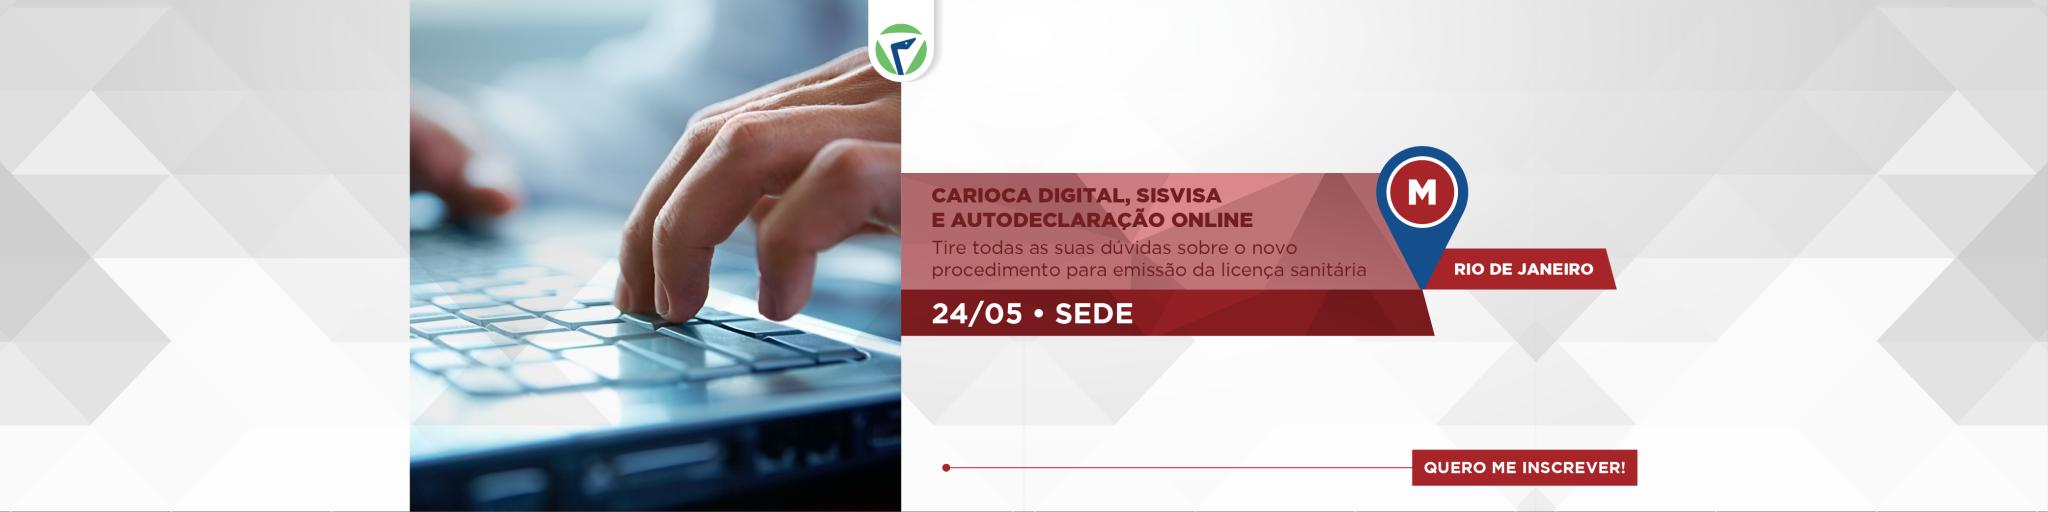 2017-04-12_Ascoferj_CariocaDigital_V01_Banner